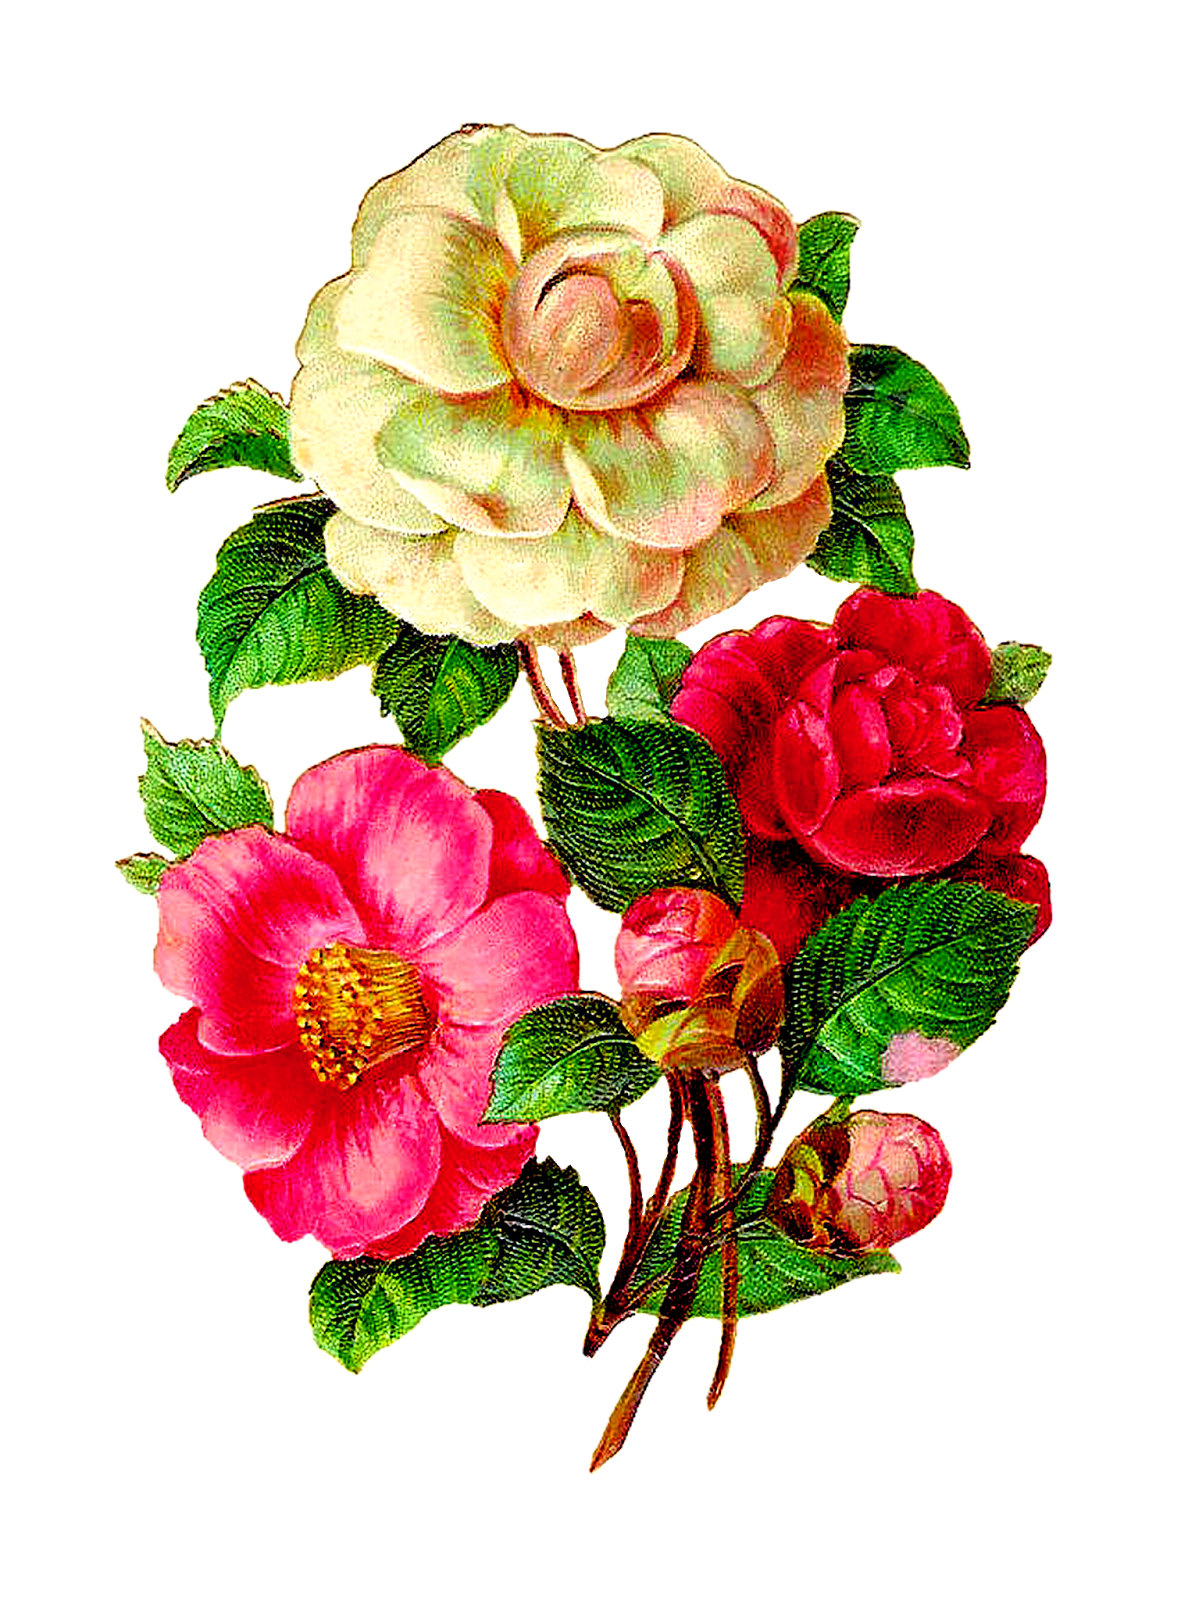 Cotton clipart printable. Afbeeldingsresultaat voor vintage flowers